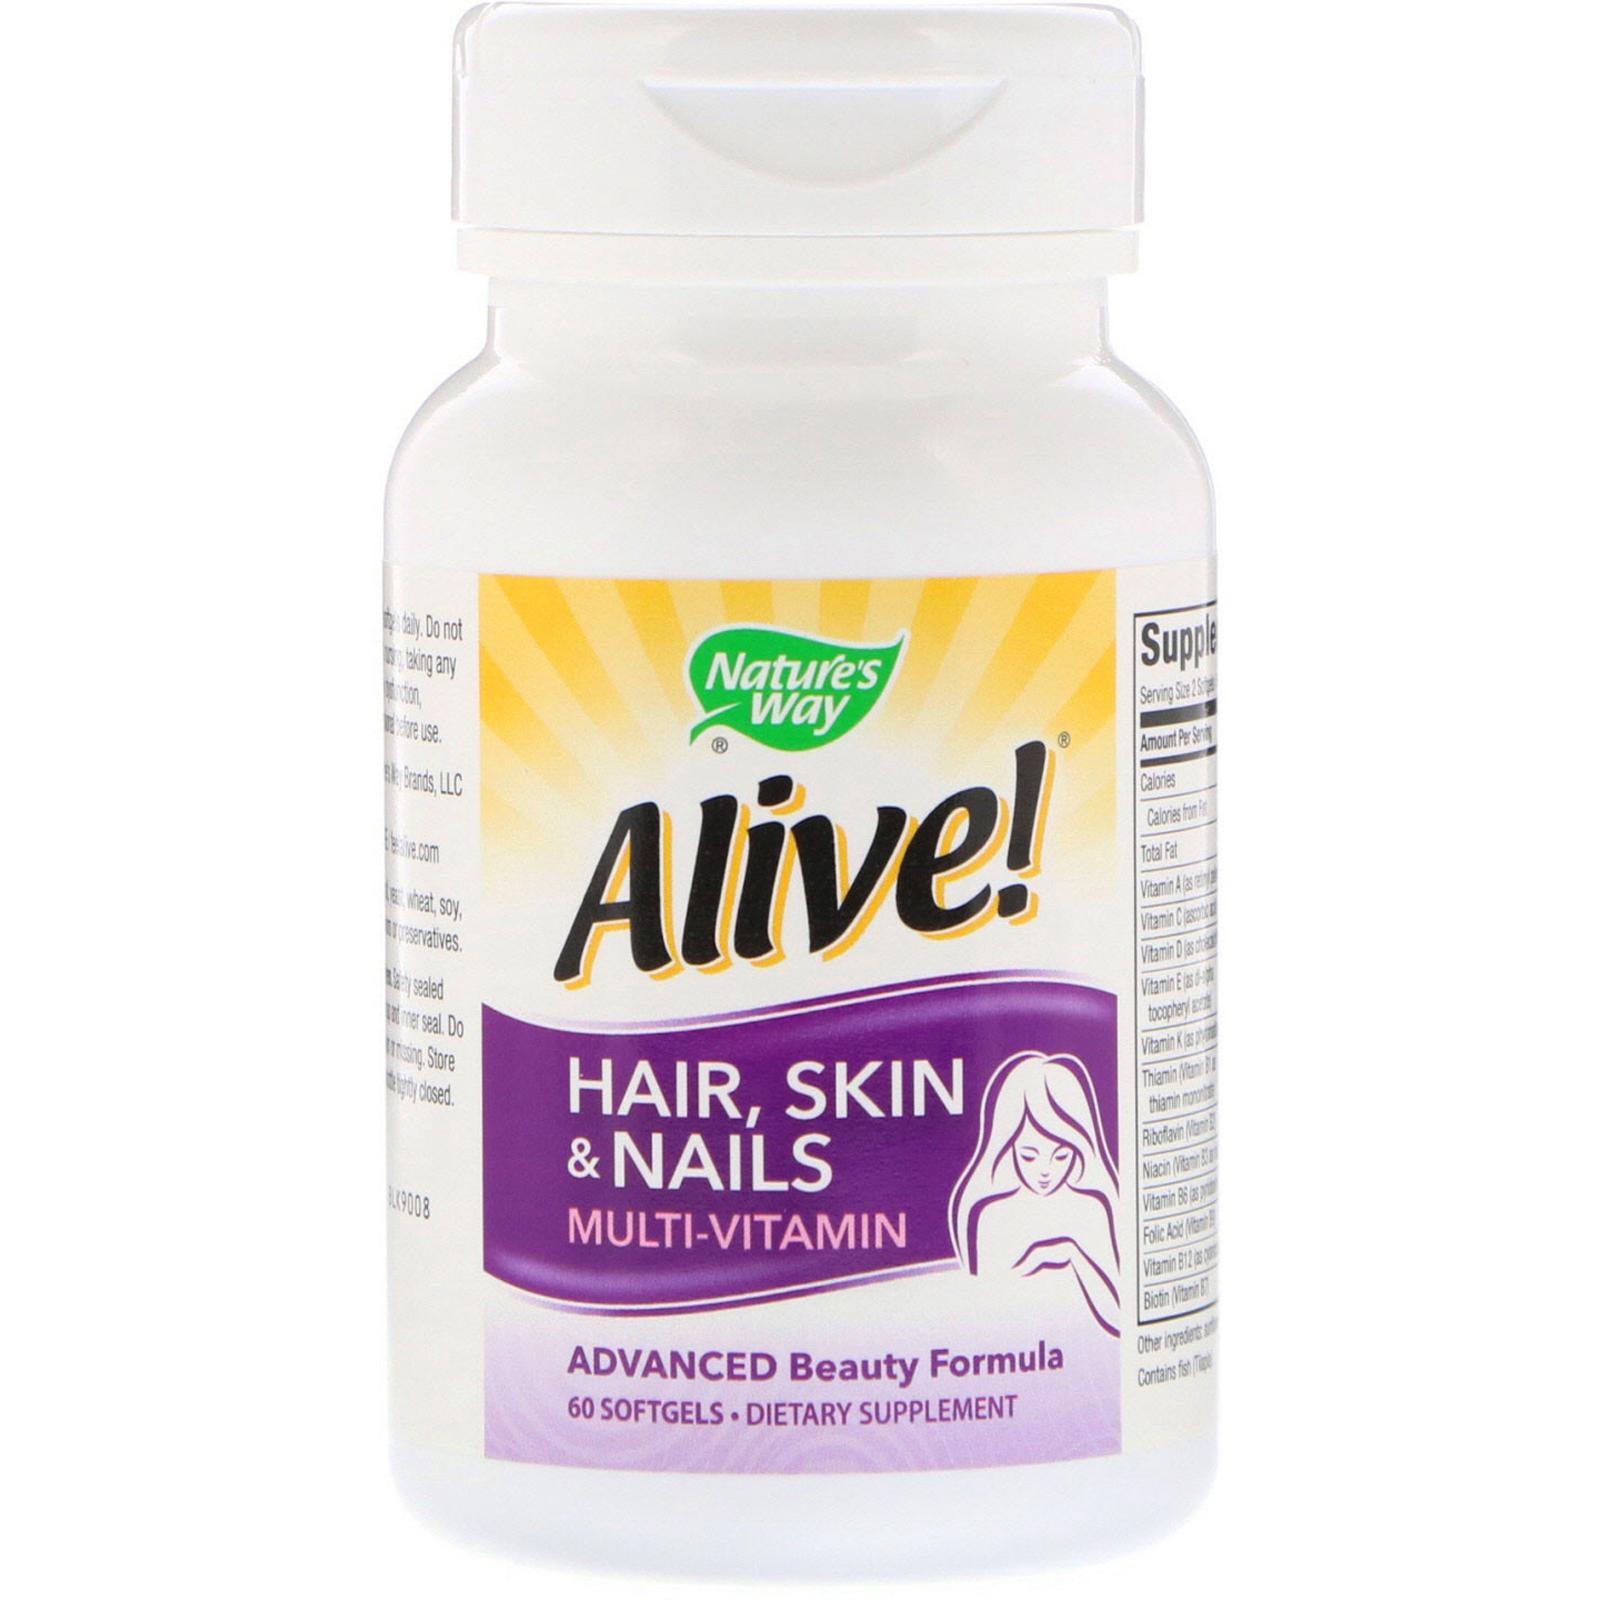 alive hair skin and nails reviews